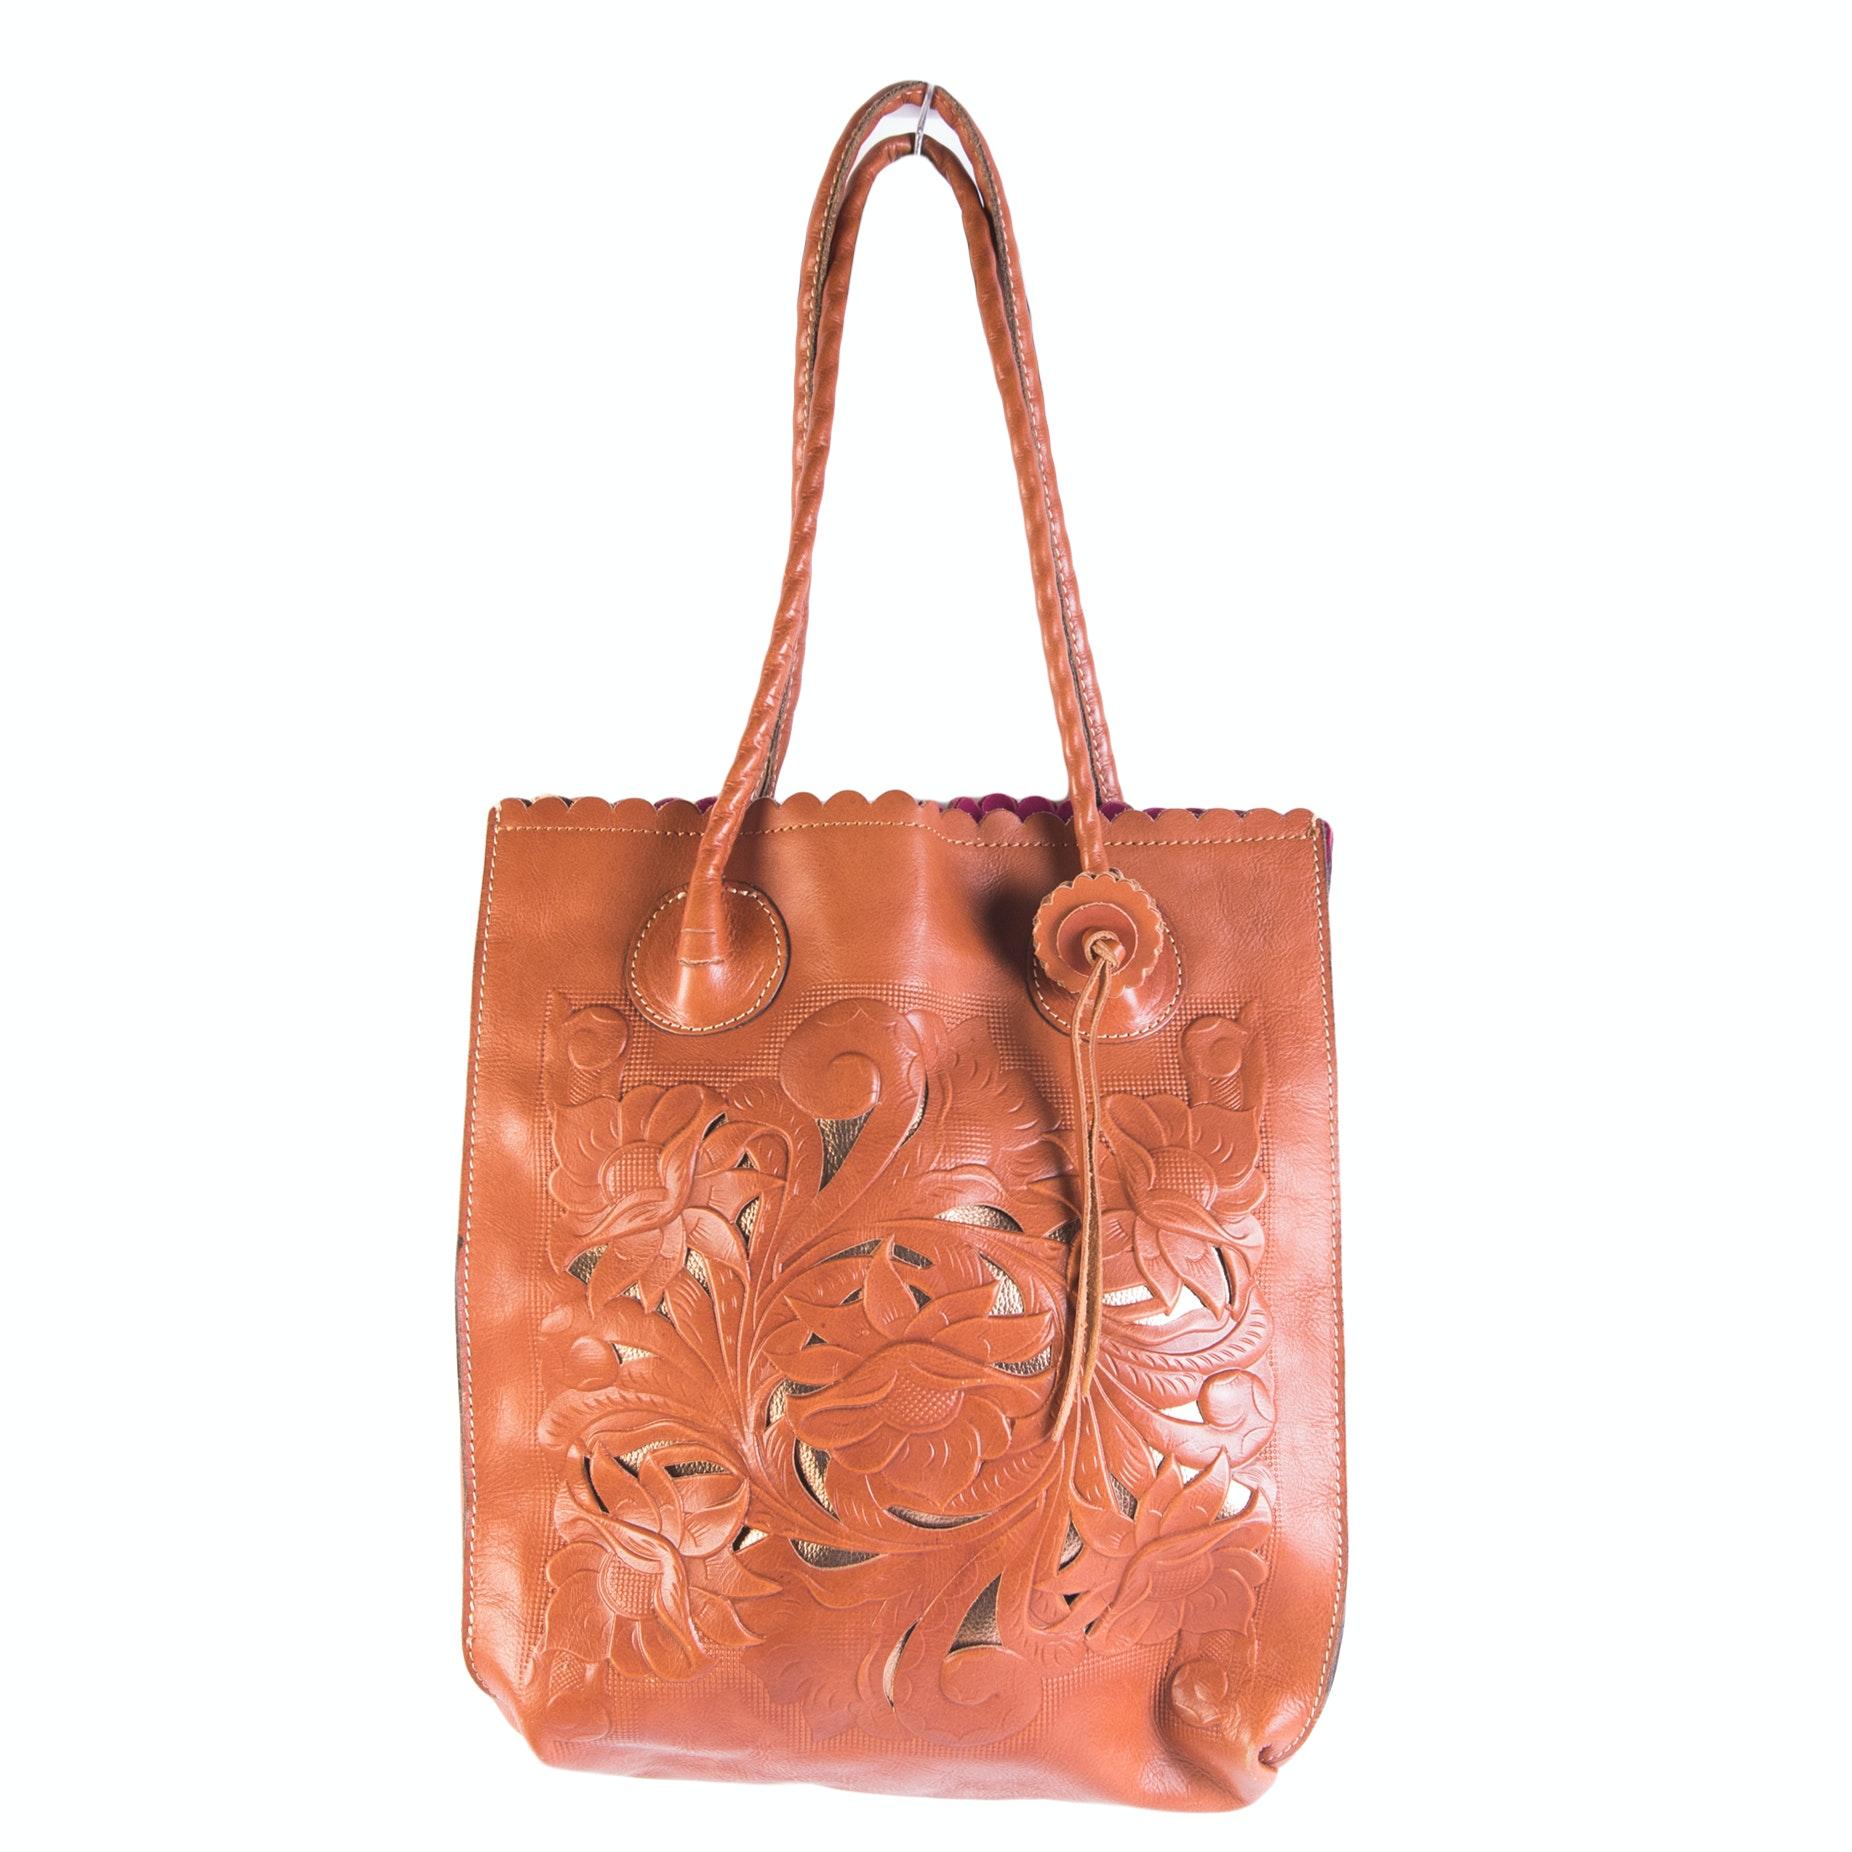 Patricia Nash Tooled Leather Tote Bag